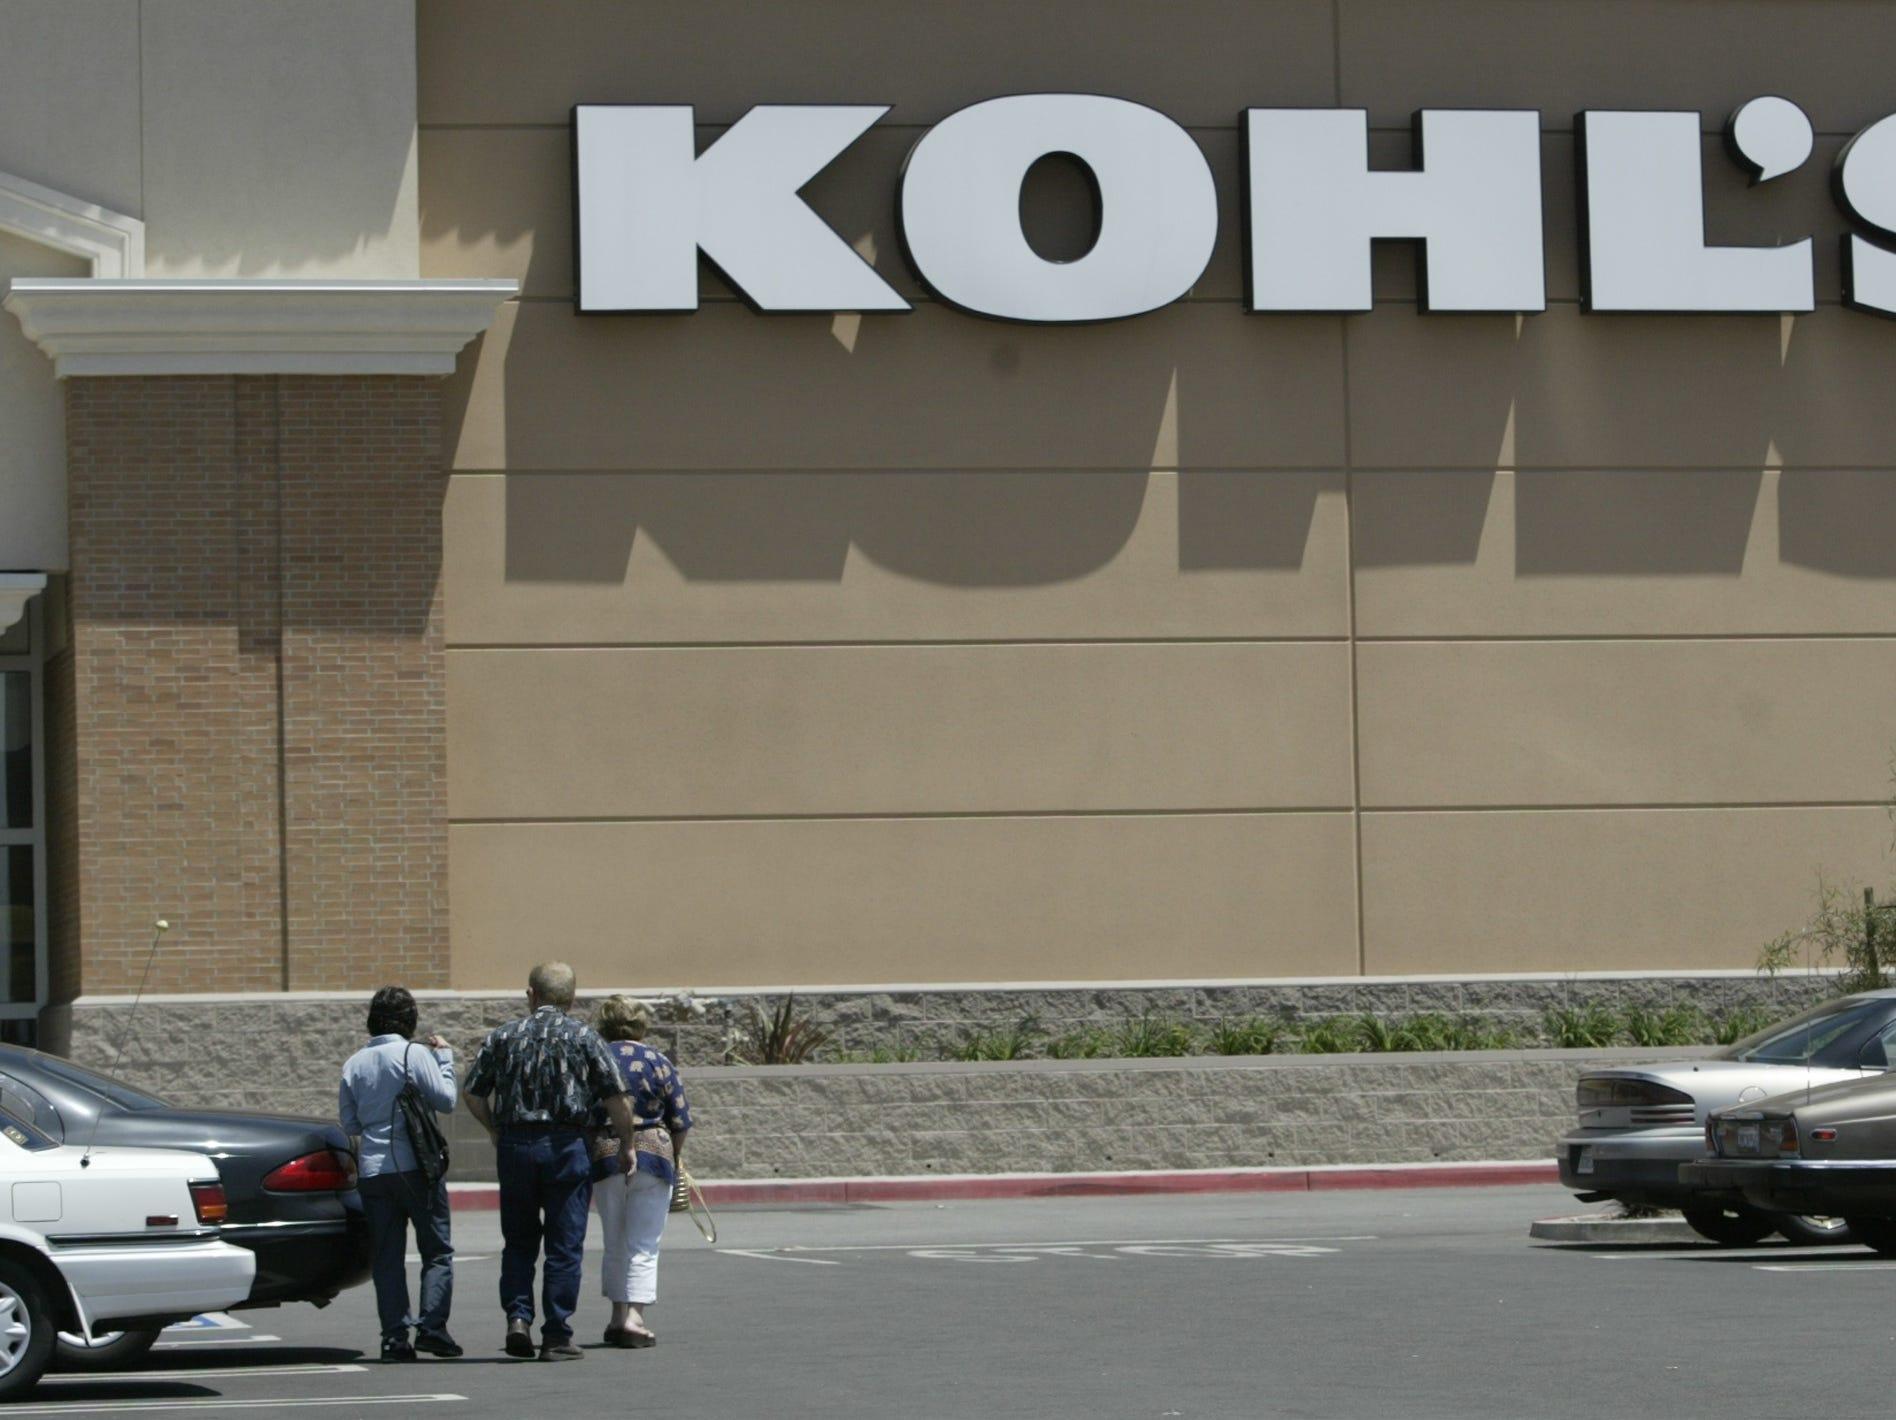 No. 68 (tie): Kohl's Corp. | Department stores | 2019 employees: 2,700 | 2018 employees: 2,600 | Ownership:Public | Headquarters: Menomonee Falls, Wisconsin |www.kohls.com